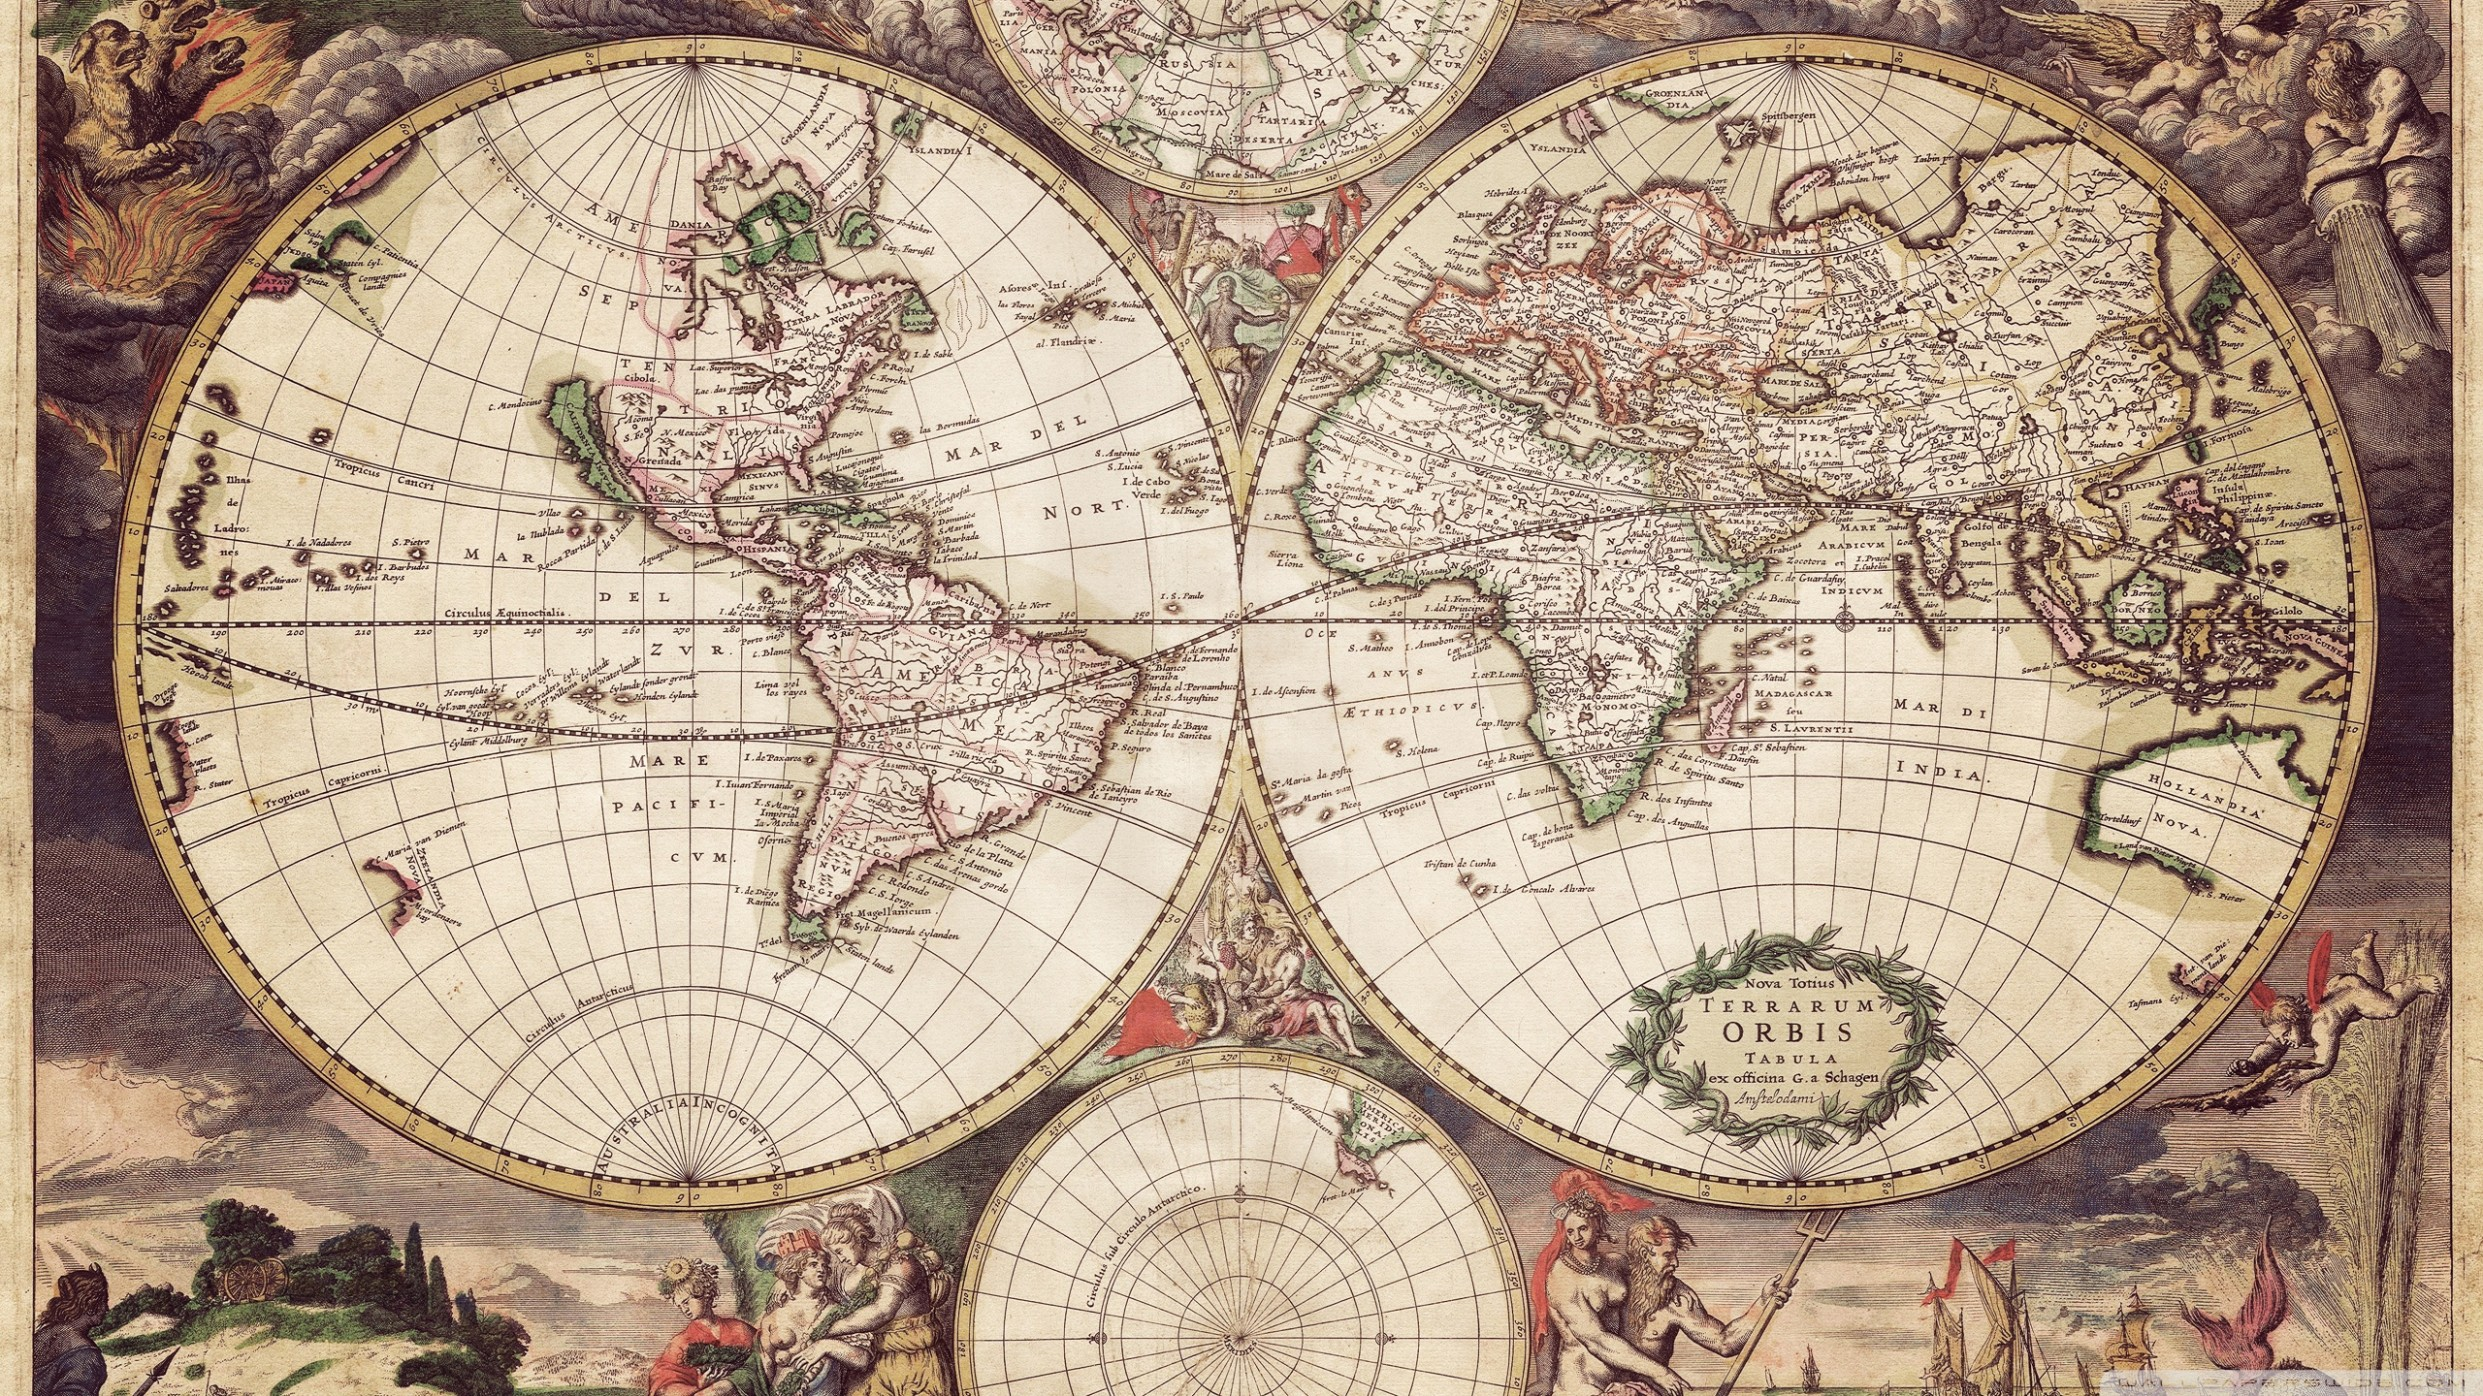 2483x1396 World Map Wallpaper Vintage Tumblr